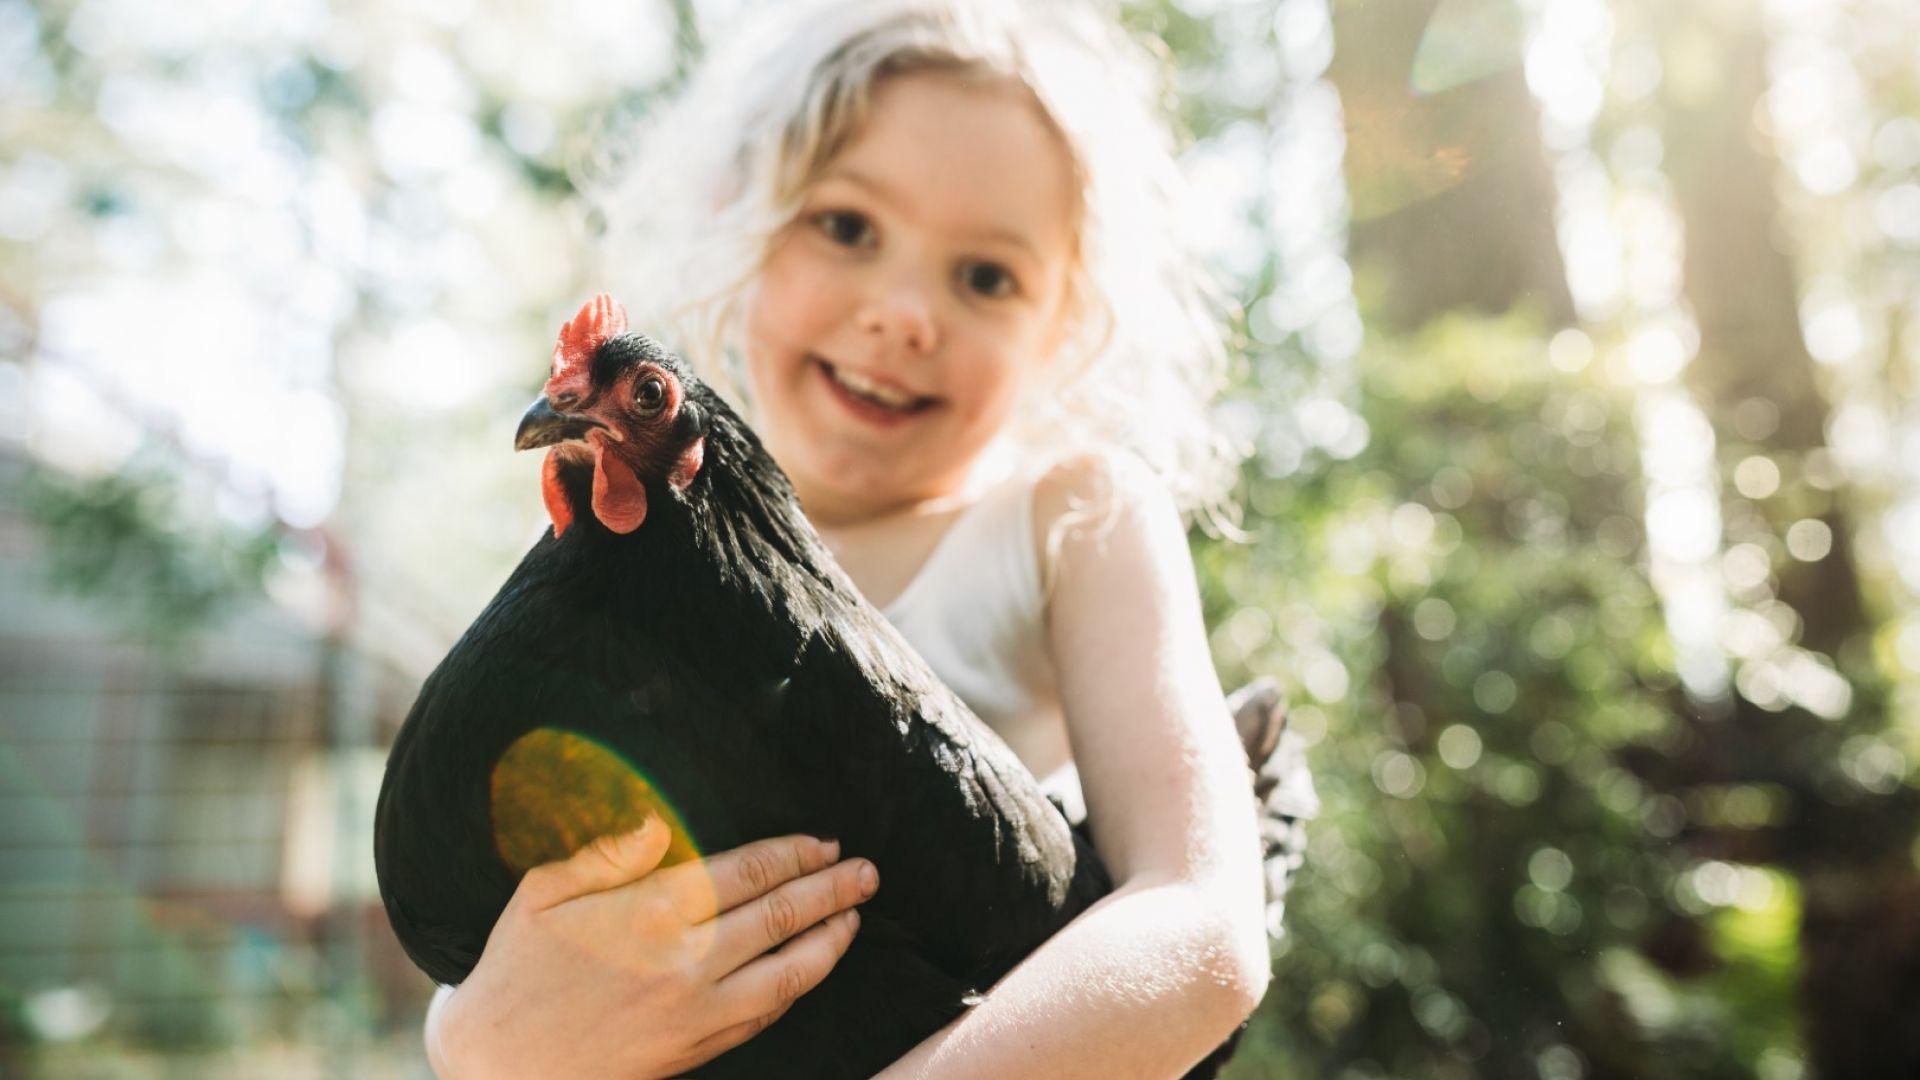 Изберете пиле, вместо бифтек, за да спасите света